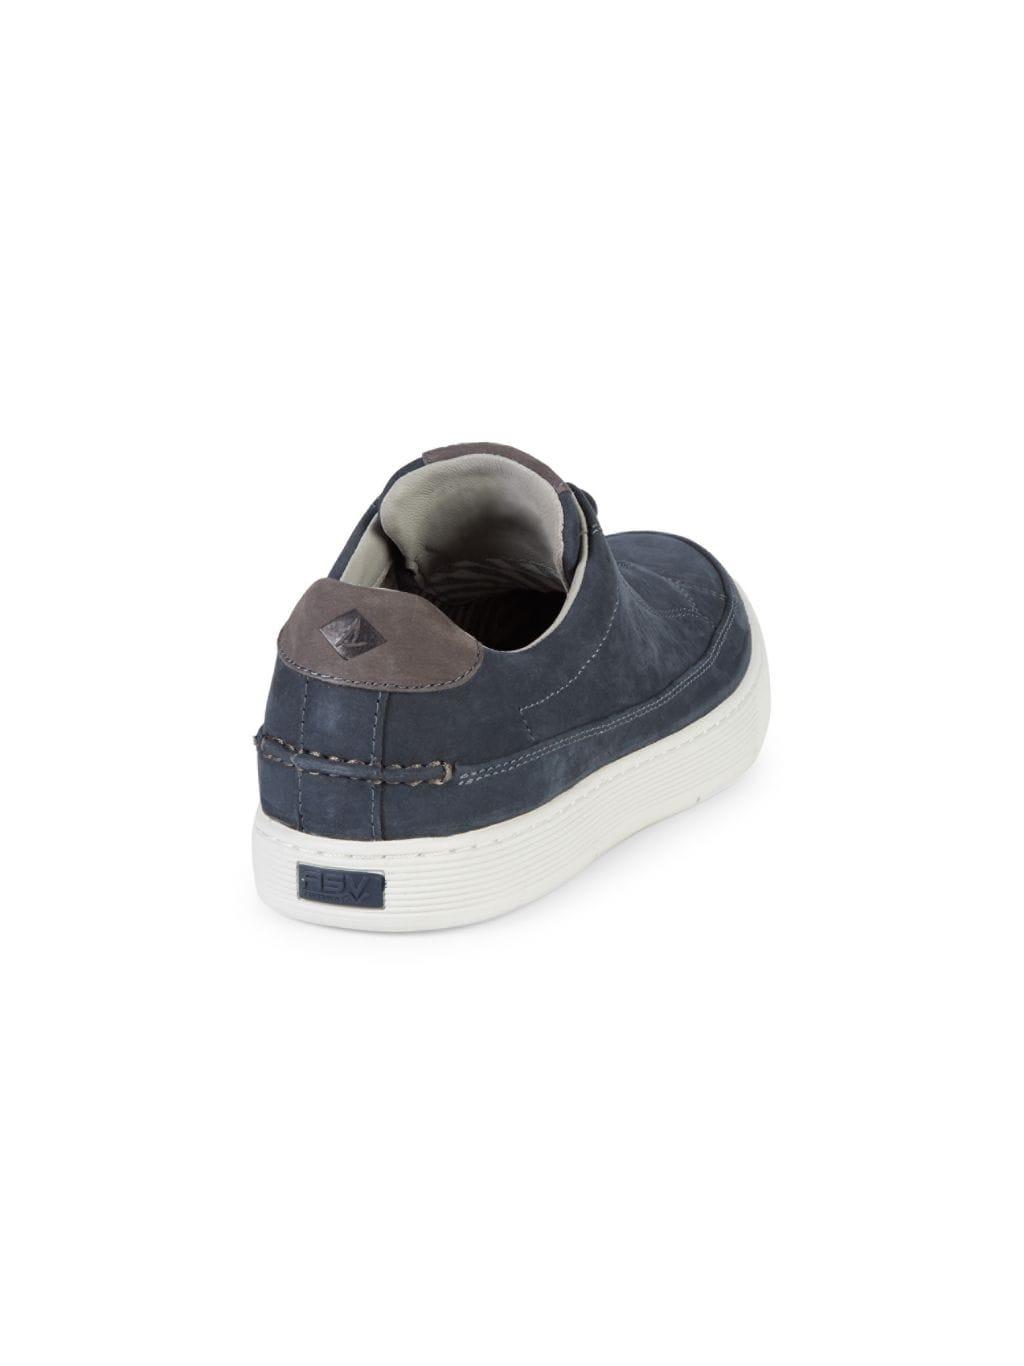 Sperry Milbridge Low-Top Leather Sneakers